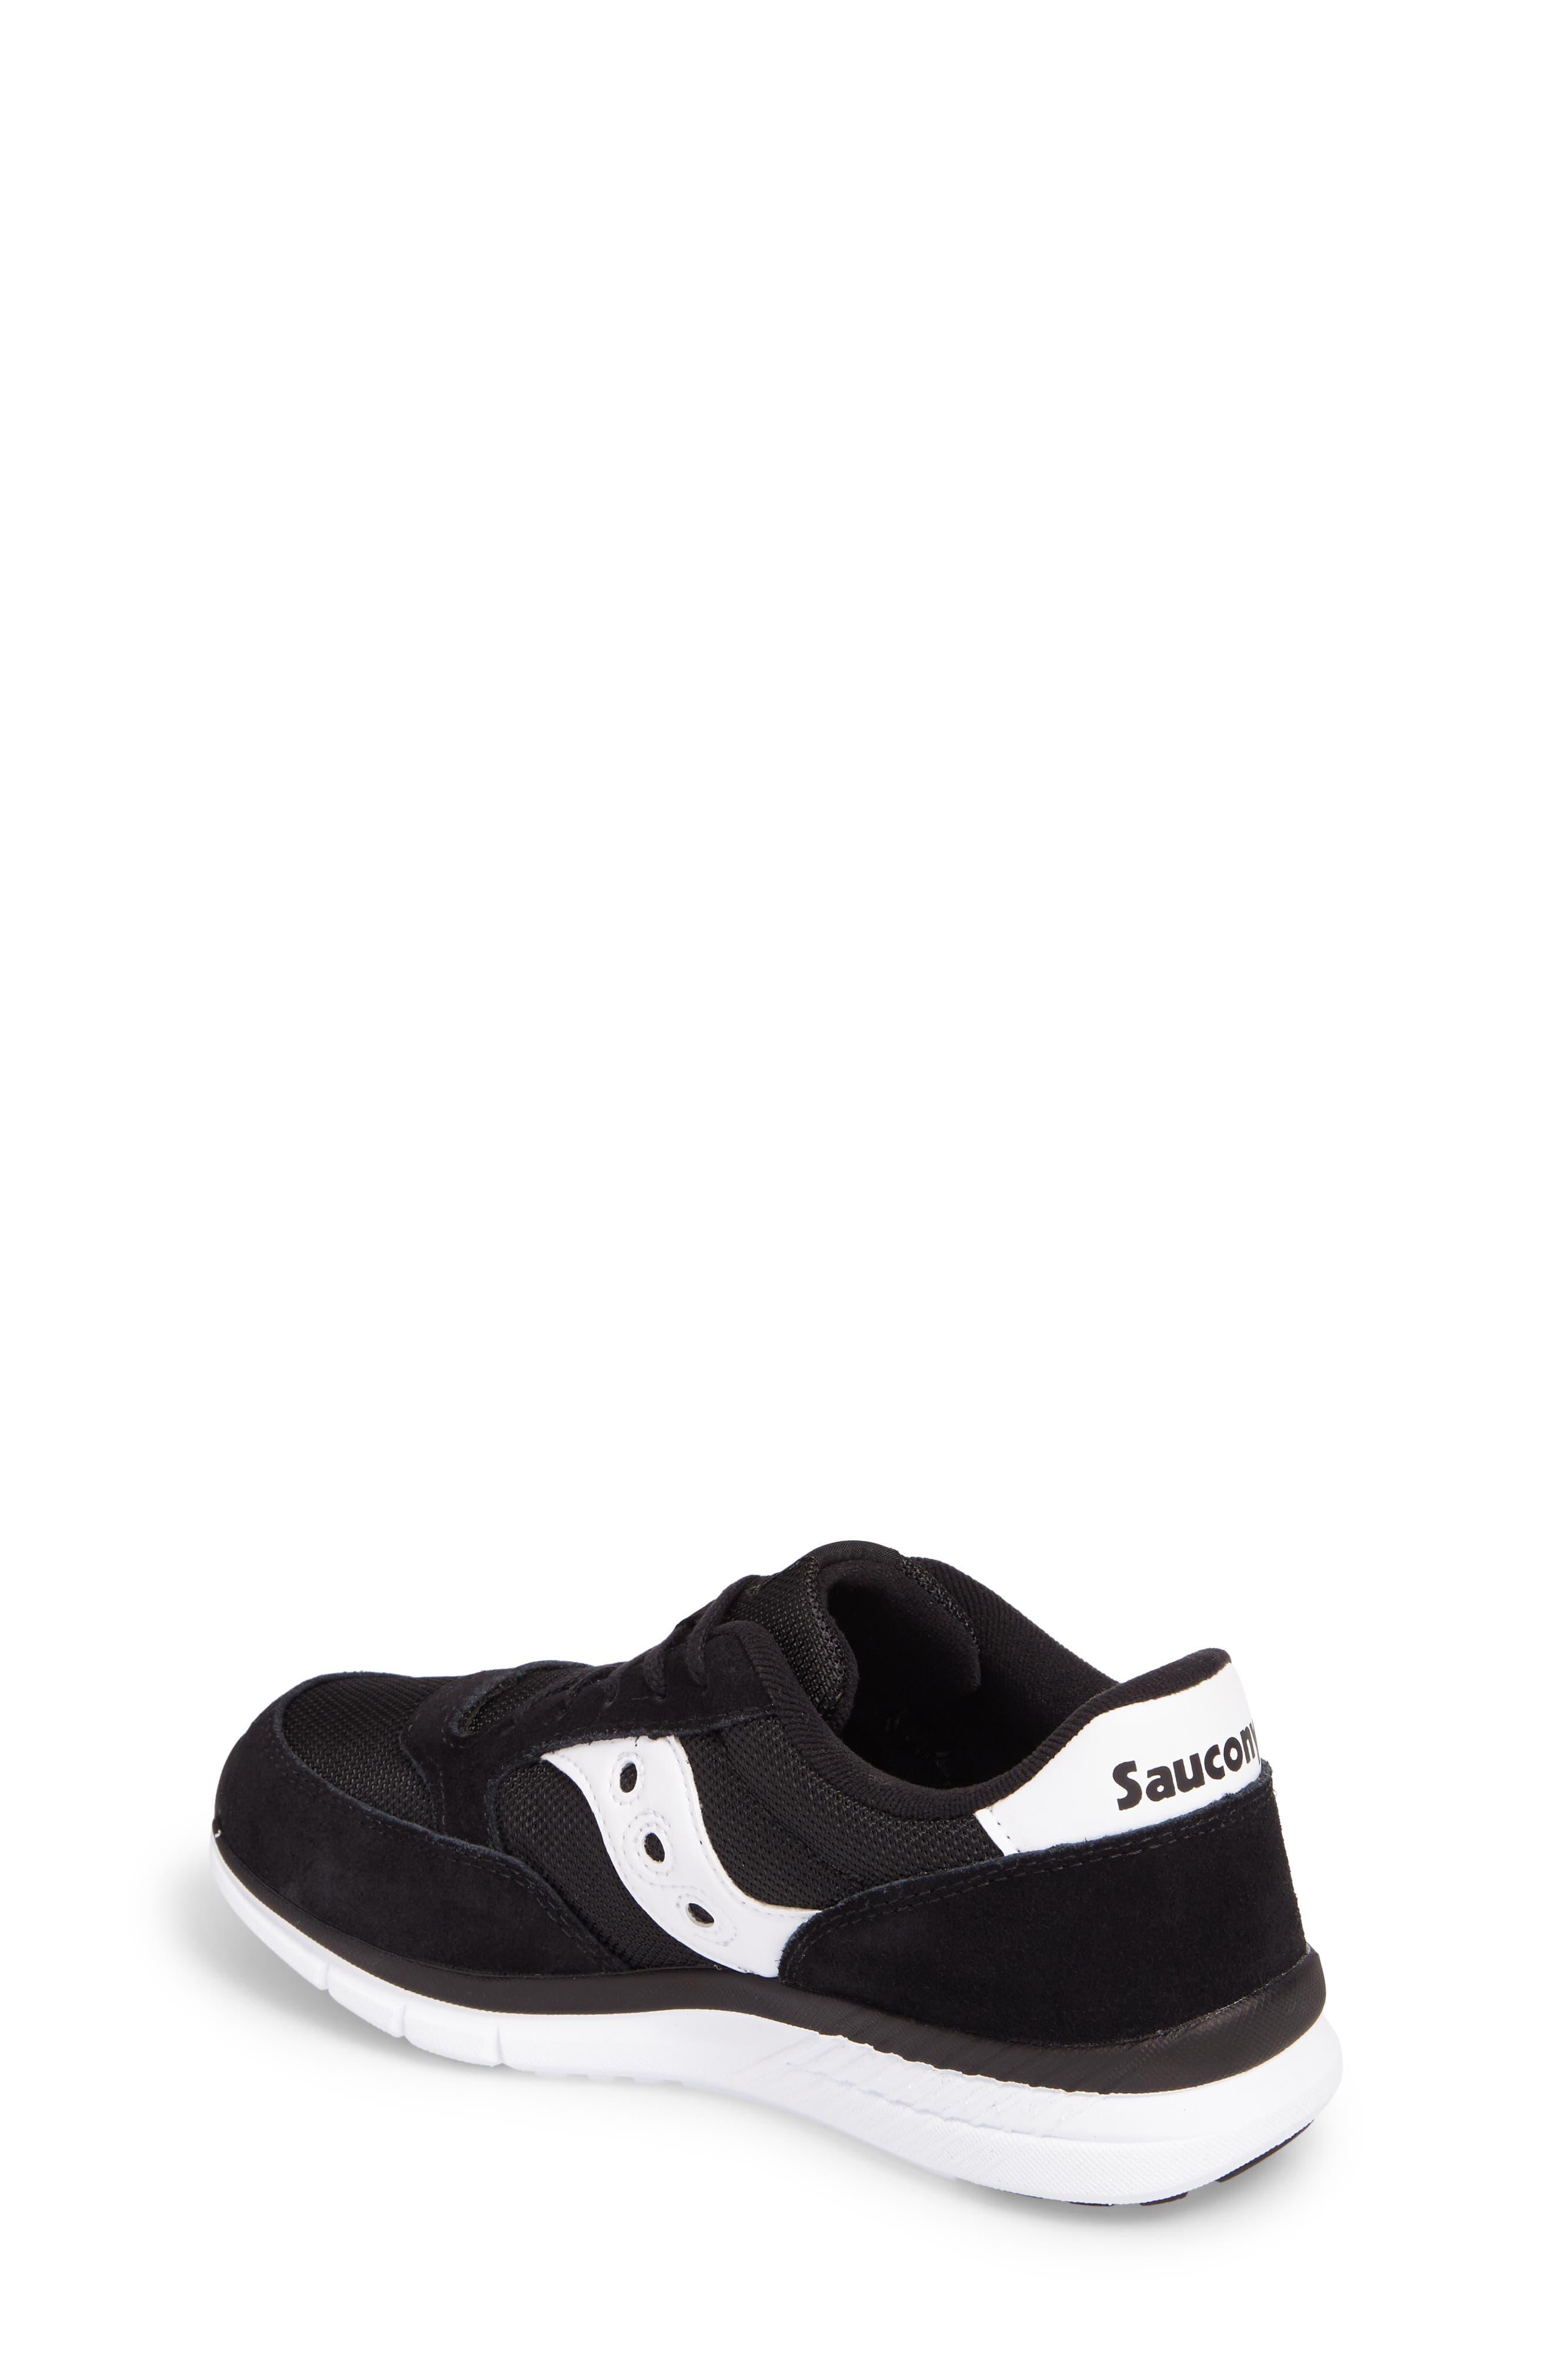 Jazz Lite Athletic Shoe,                             Alternate thumbnail 2, color,                             Black/ Black